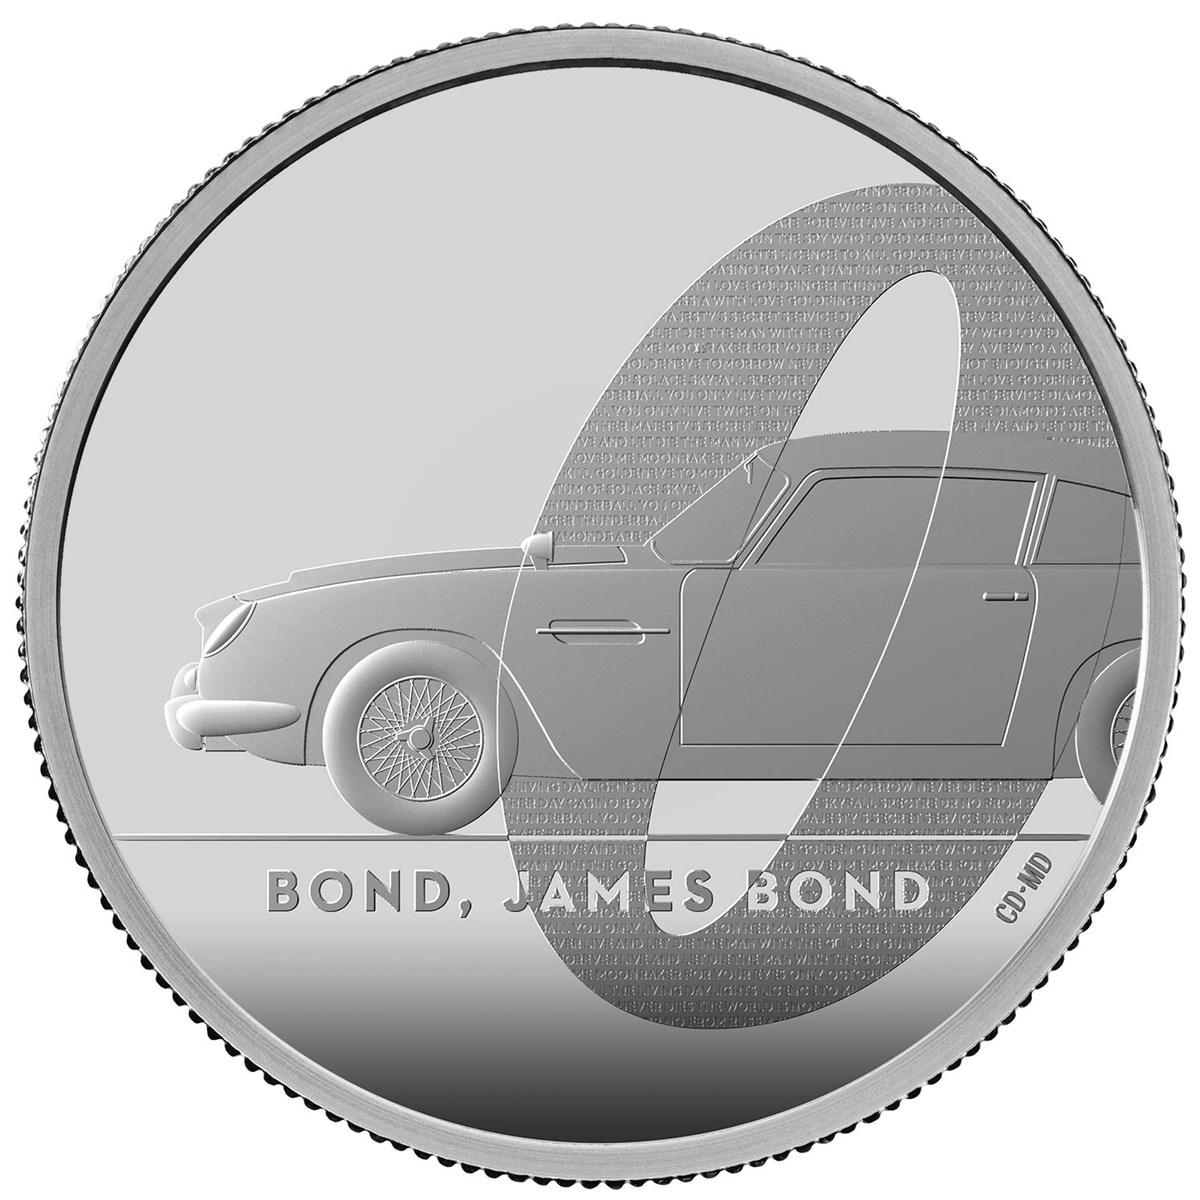 Bond, James Bond 2020 UK £1 1/2oz Silver Proof Coin